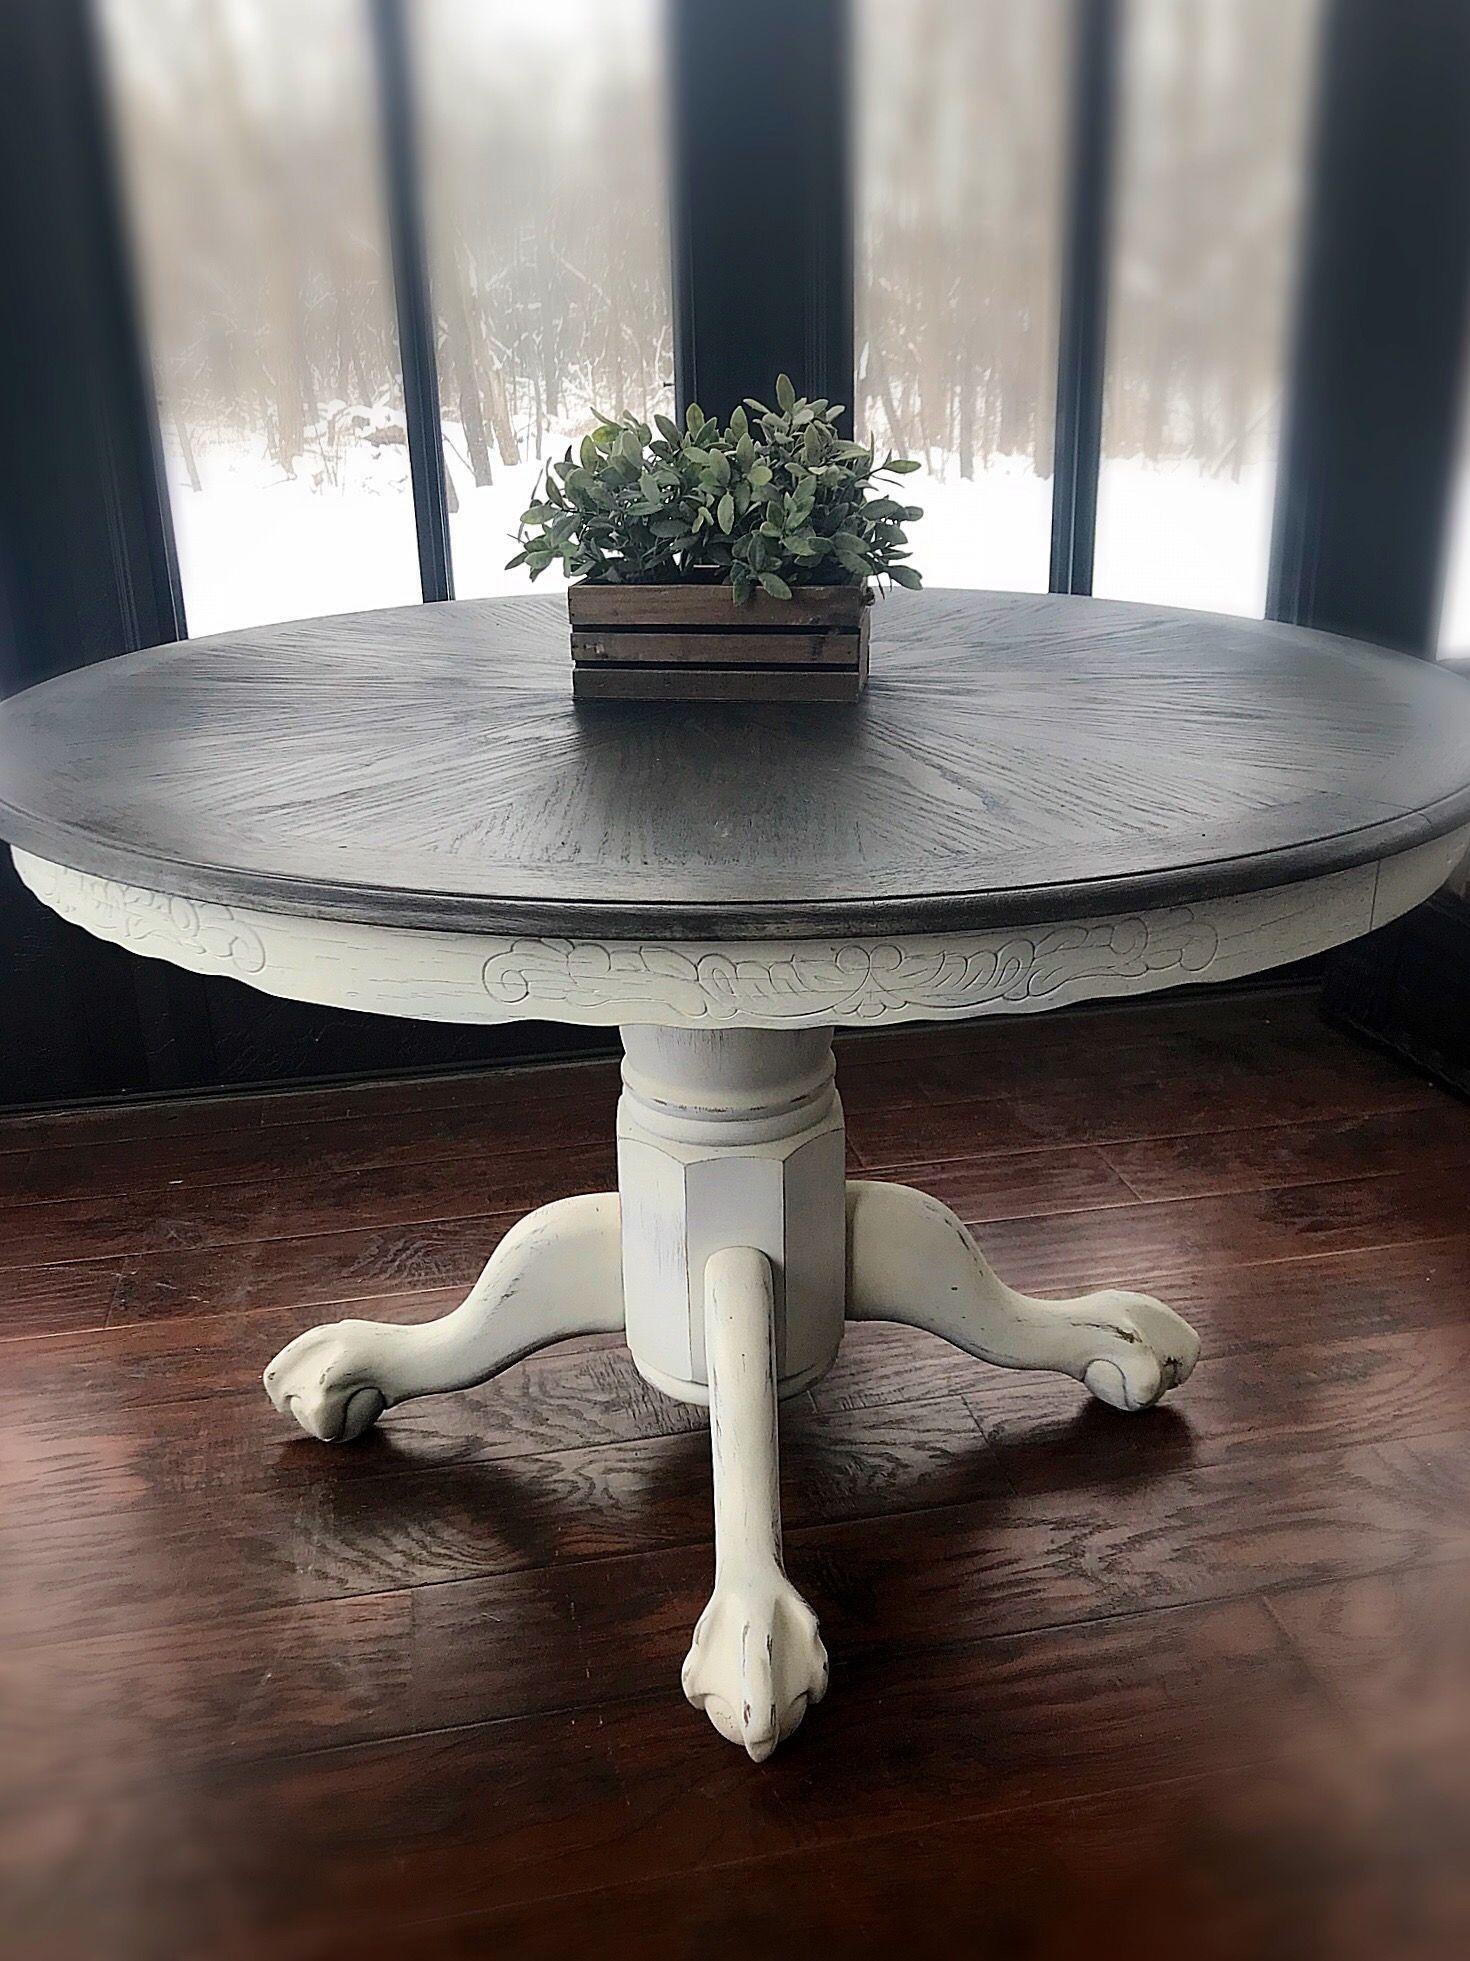 32 beautiful farmhouse kitchen table design ideas and makeover in 2020 farmhouse kitchen on farmhouse kitchen table diy id=86832